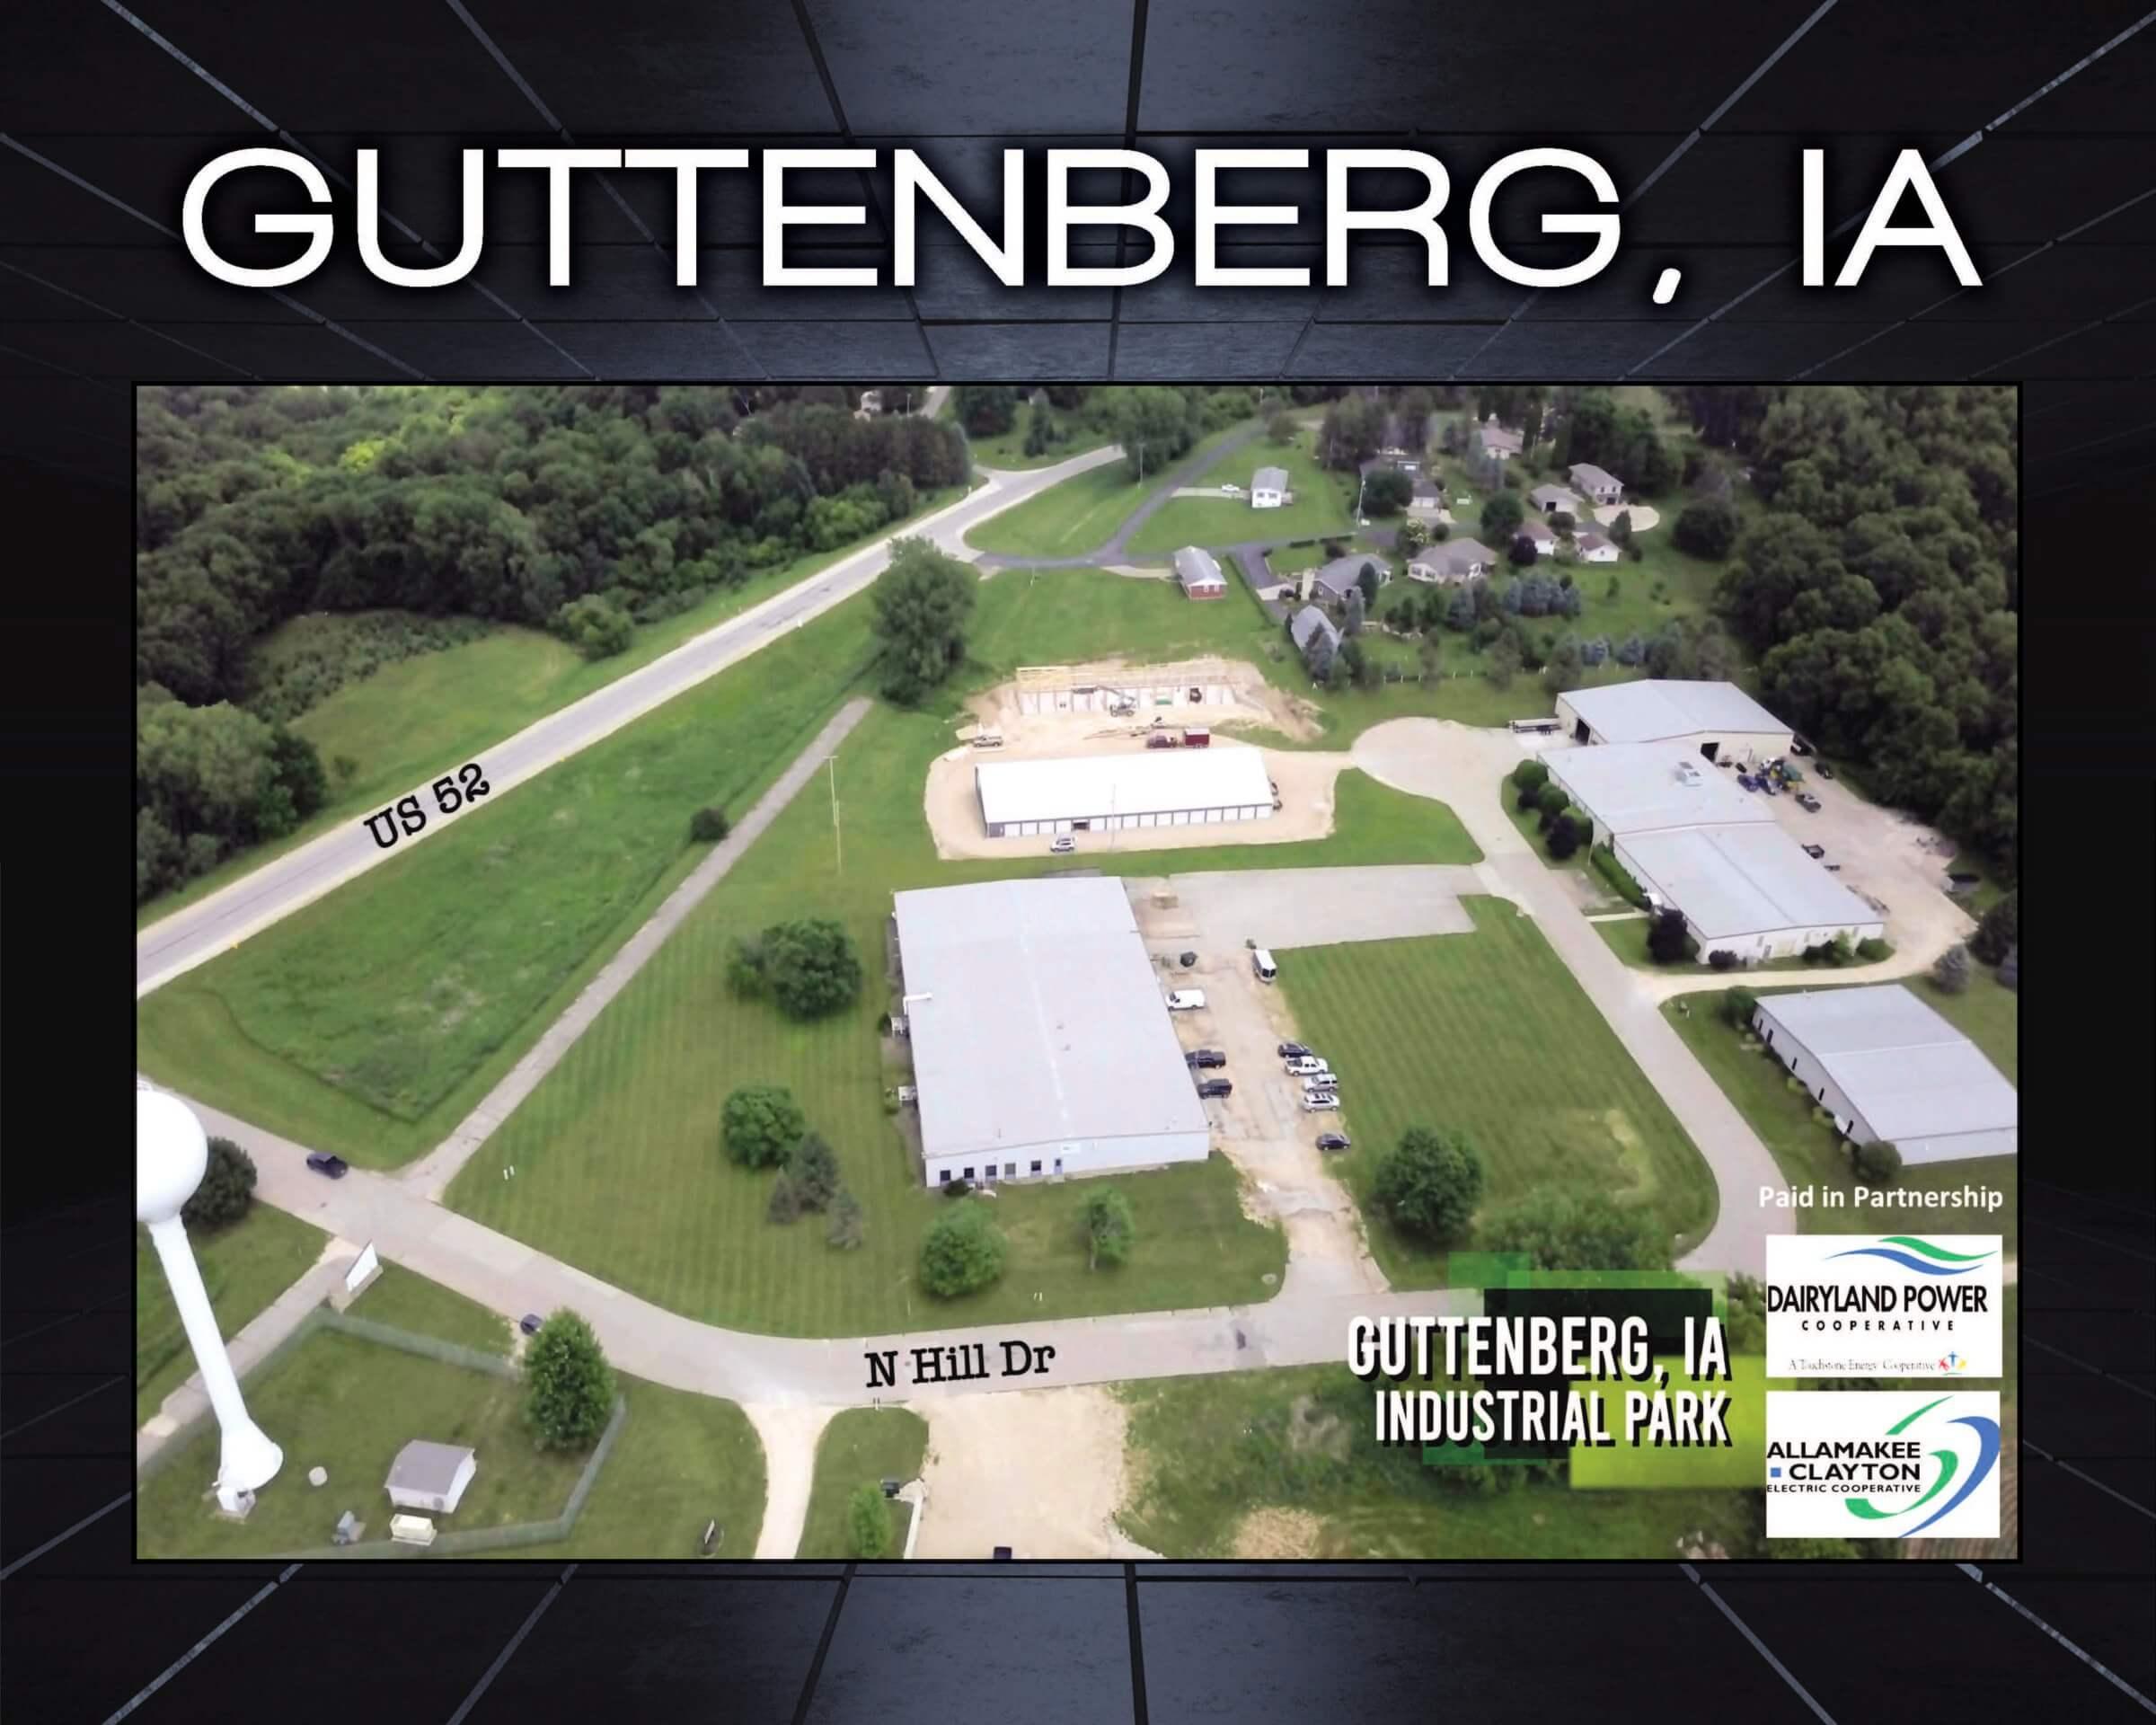 Guttenberg Industrial